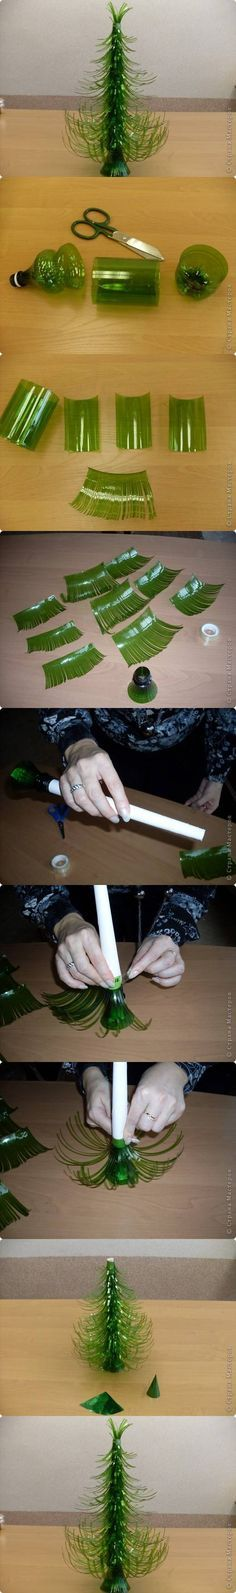 Plastic fles kerstboom